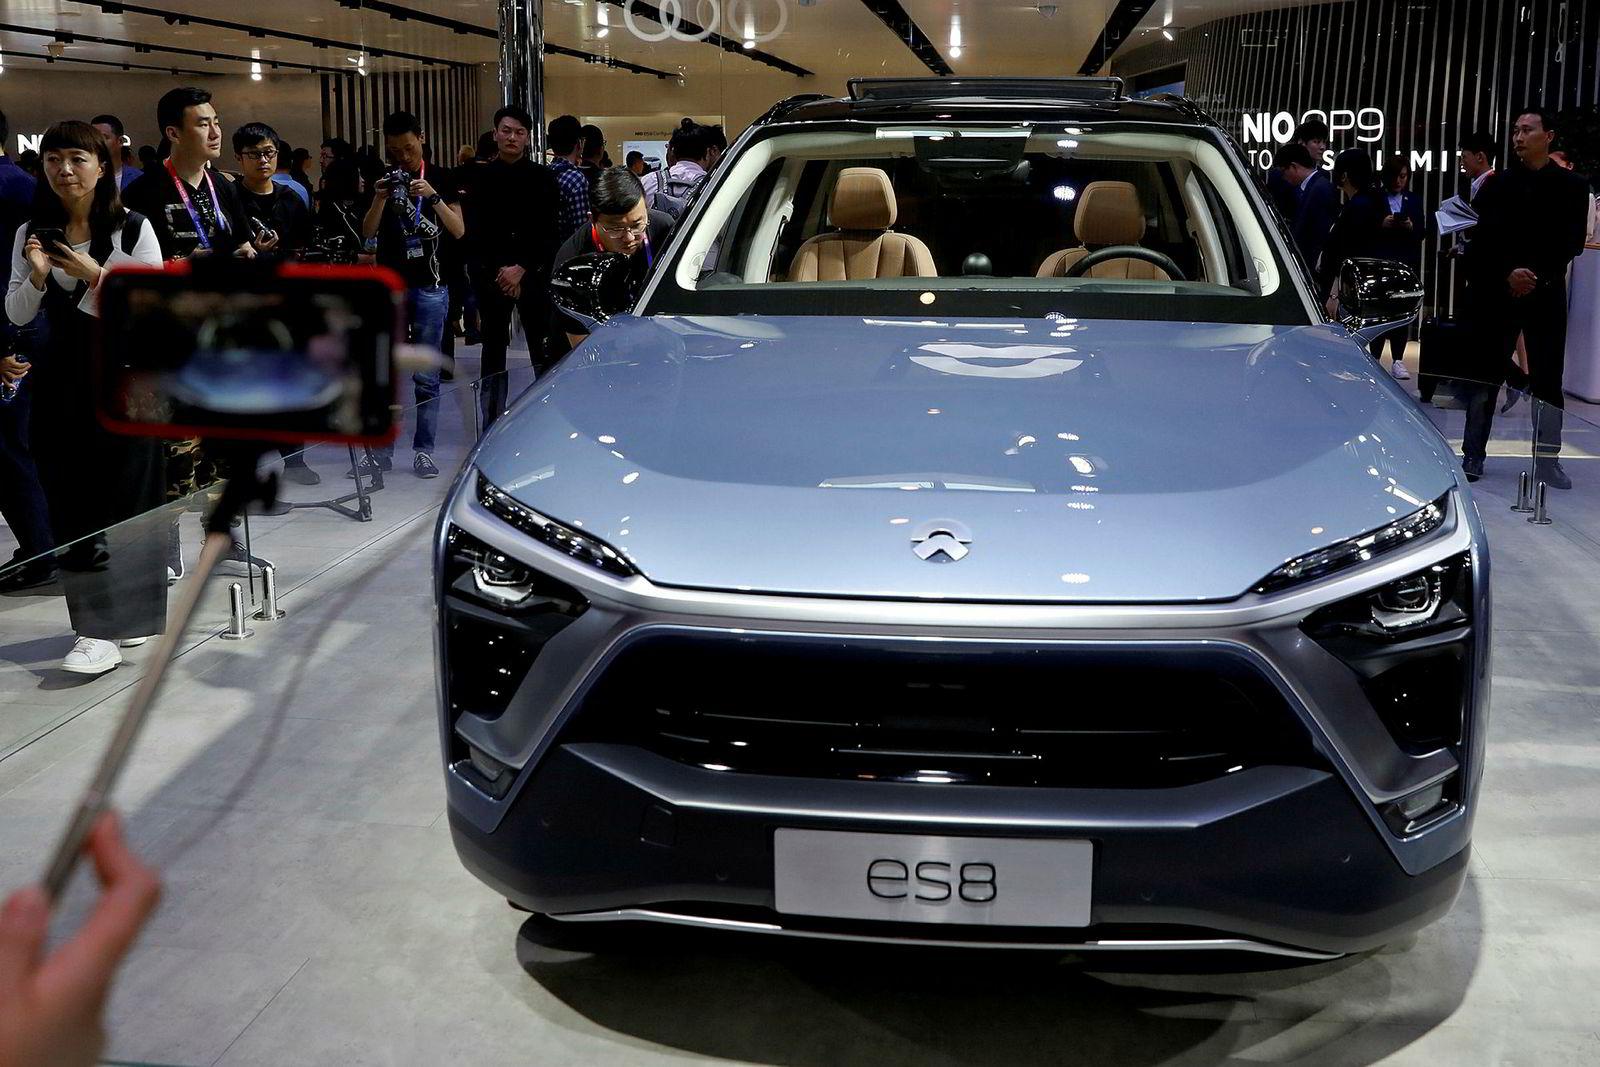 Nio ES8 utstilt på bilmessen Auto China i april, 2018.